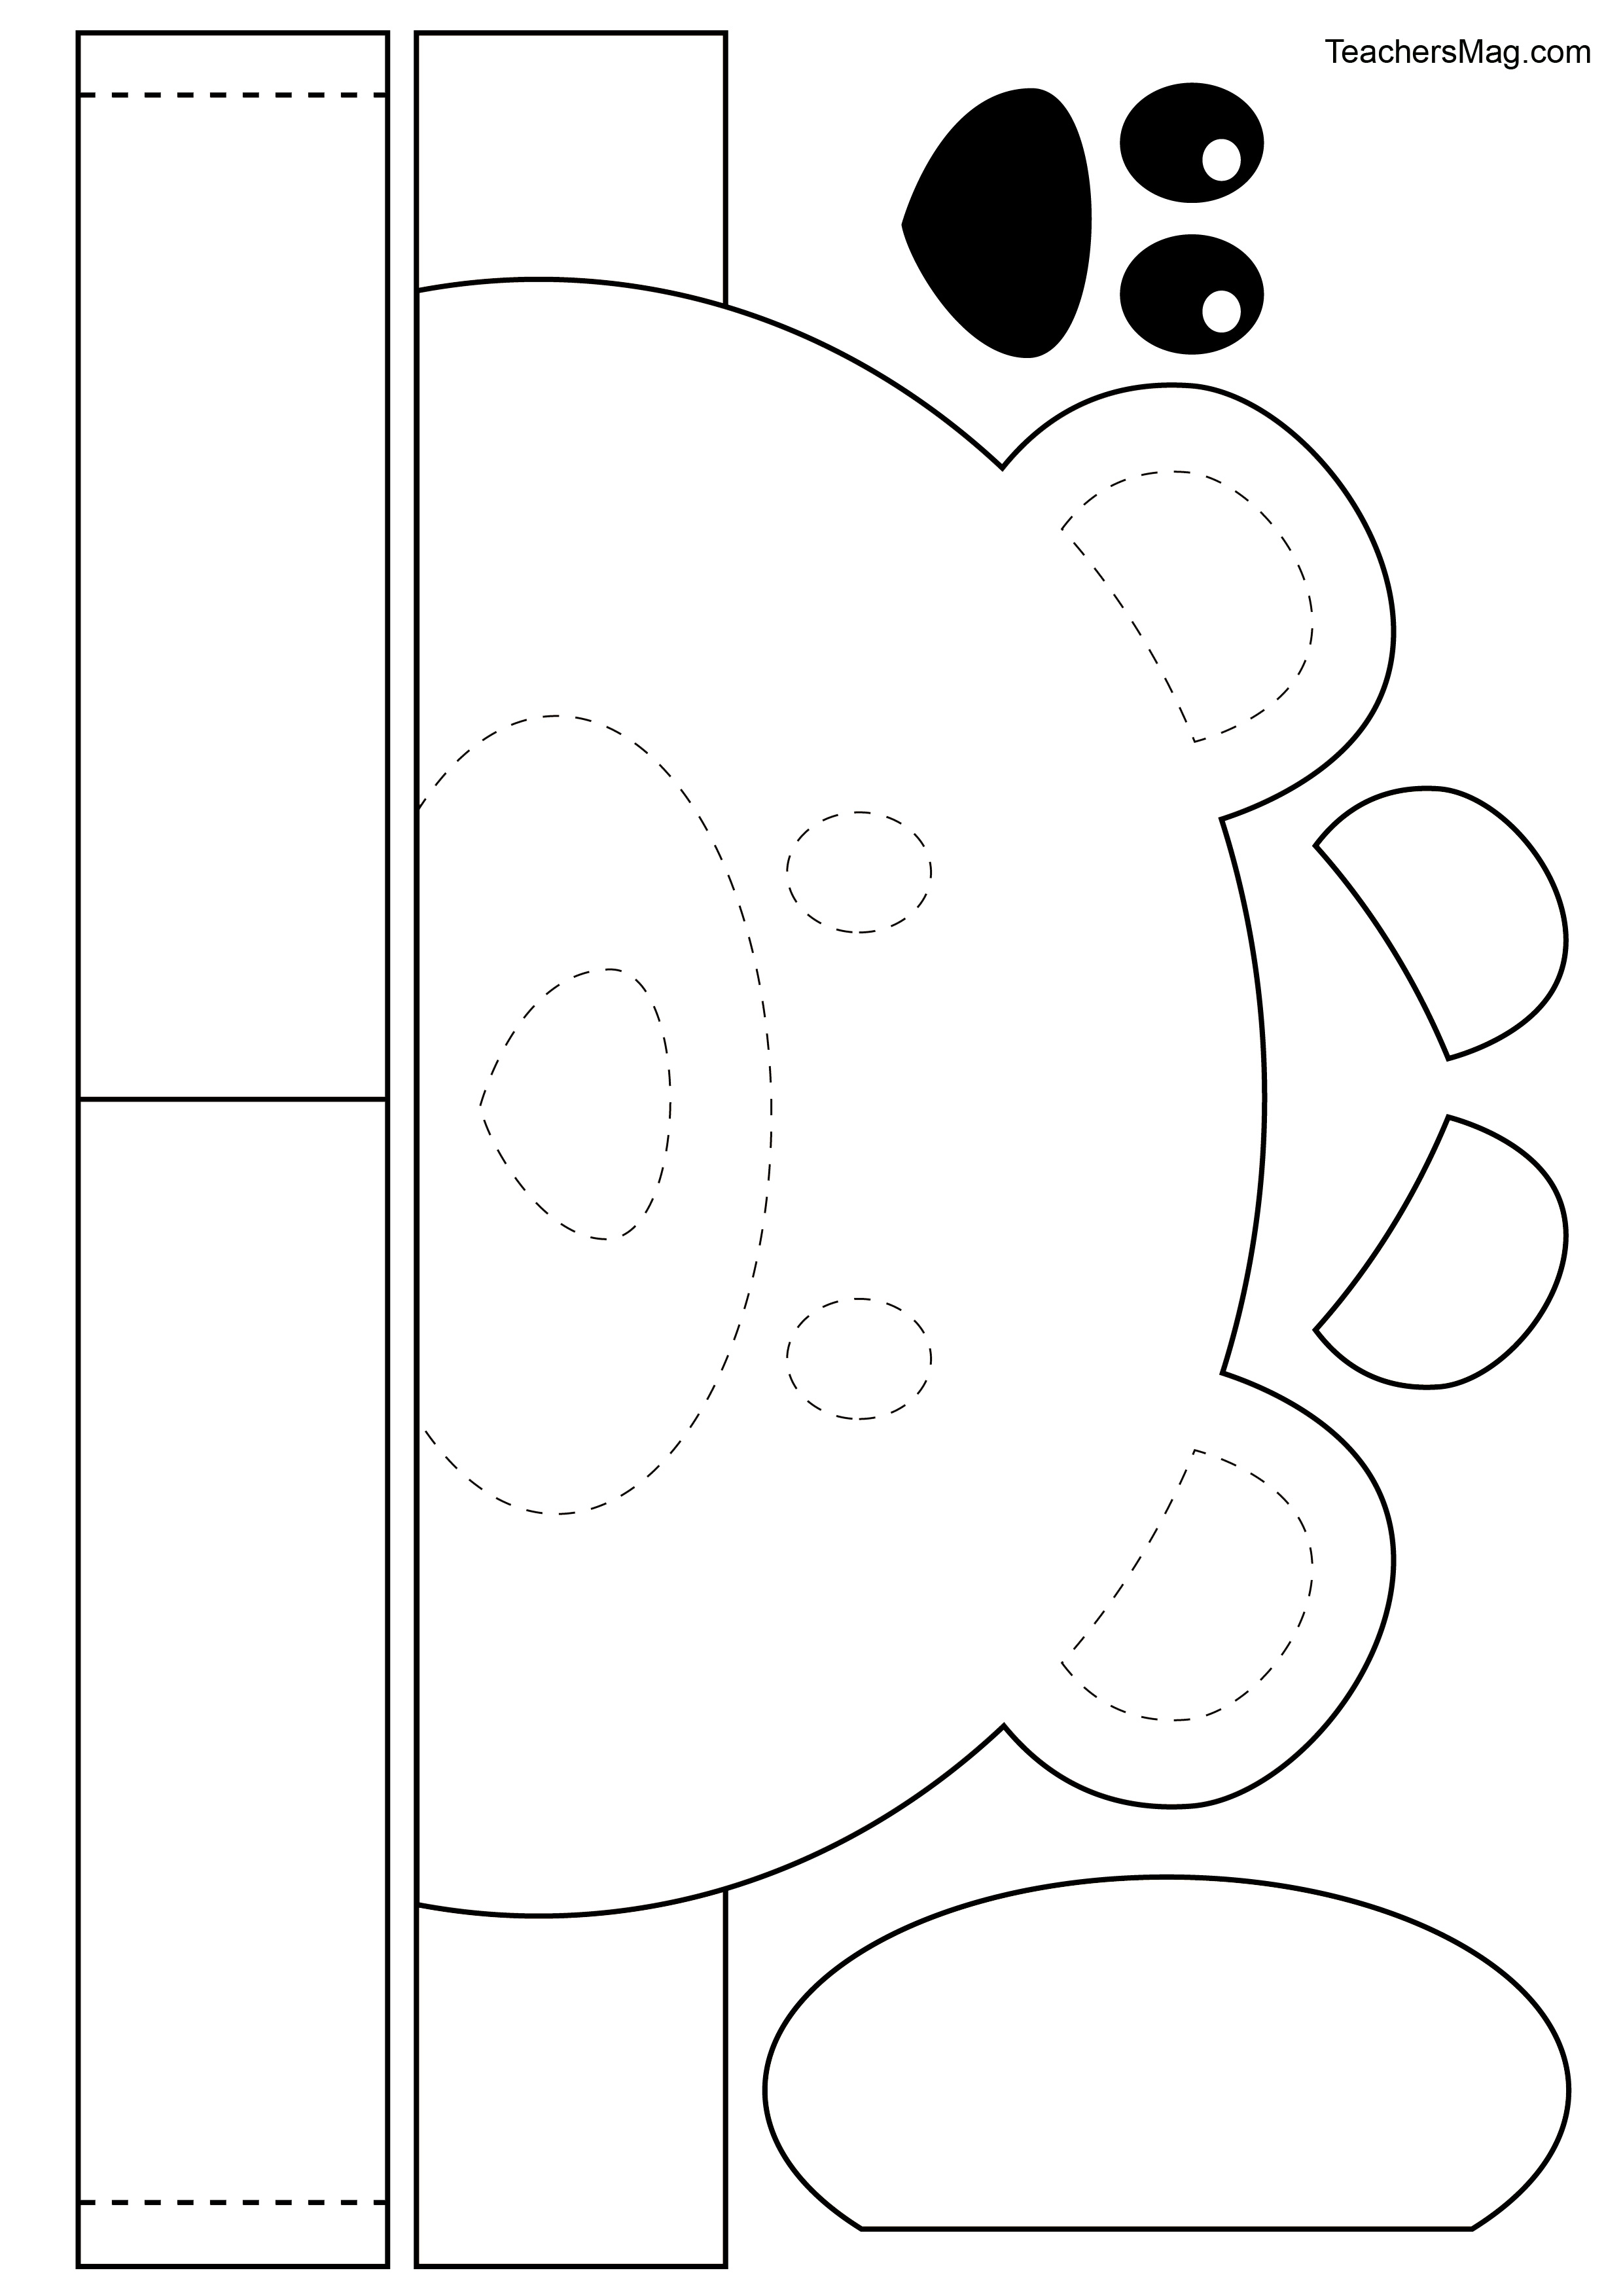 Free Printable Bear Crown For Kids Teachersmag Com